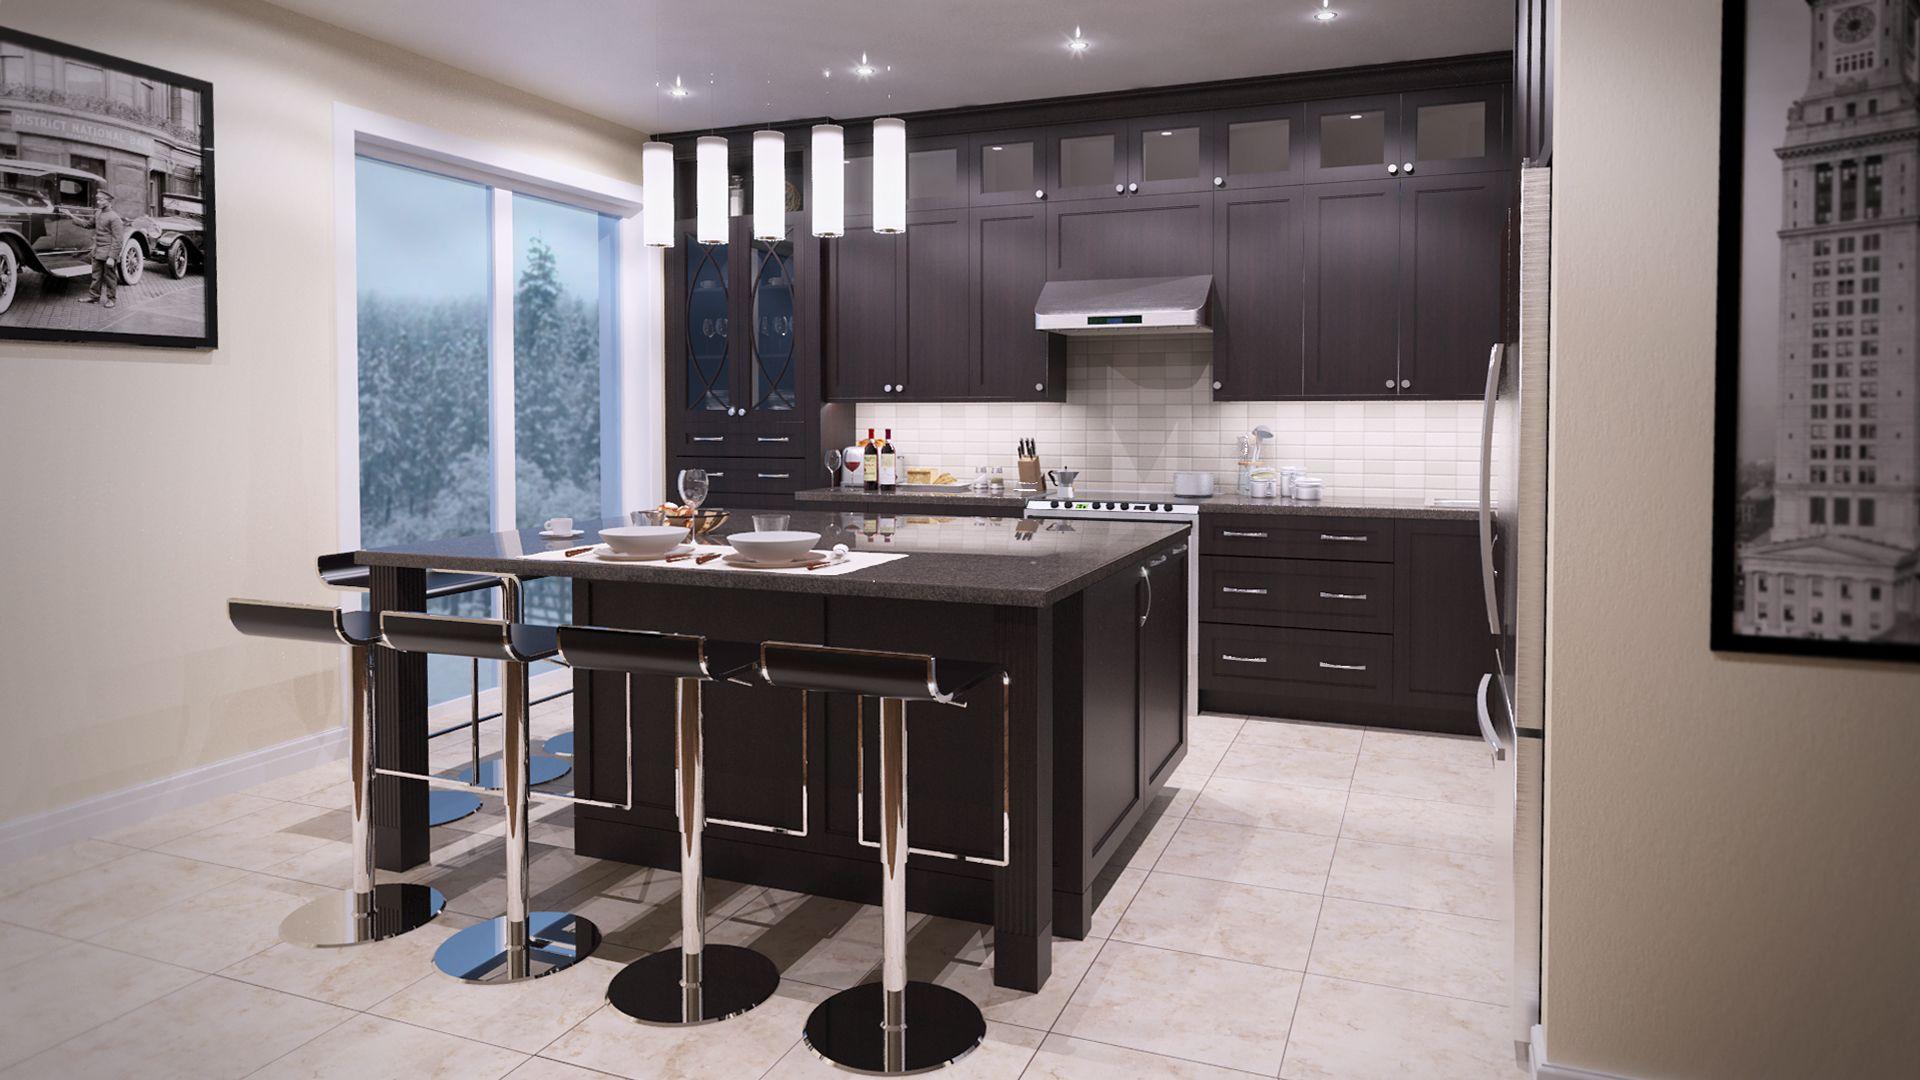 kitchen design l shape medium size with one big island design by www smanzerdesign com on l kitchen remodel id=87763